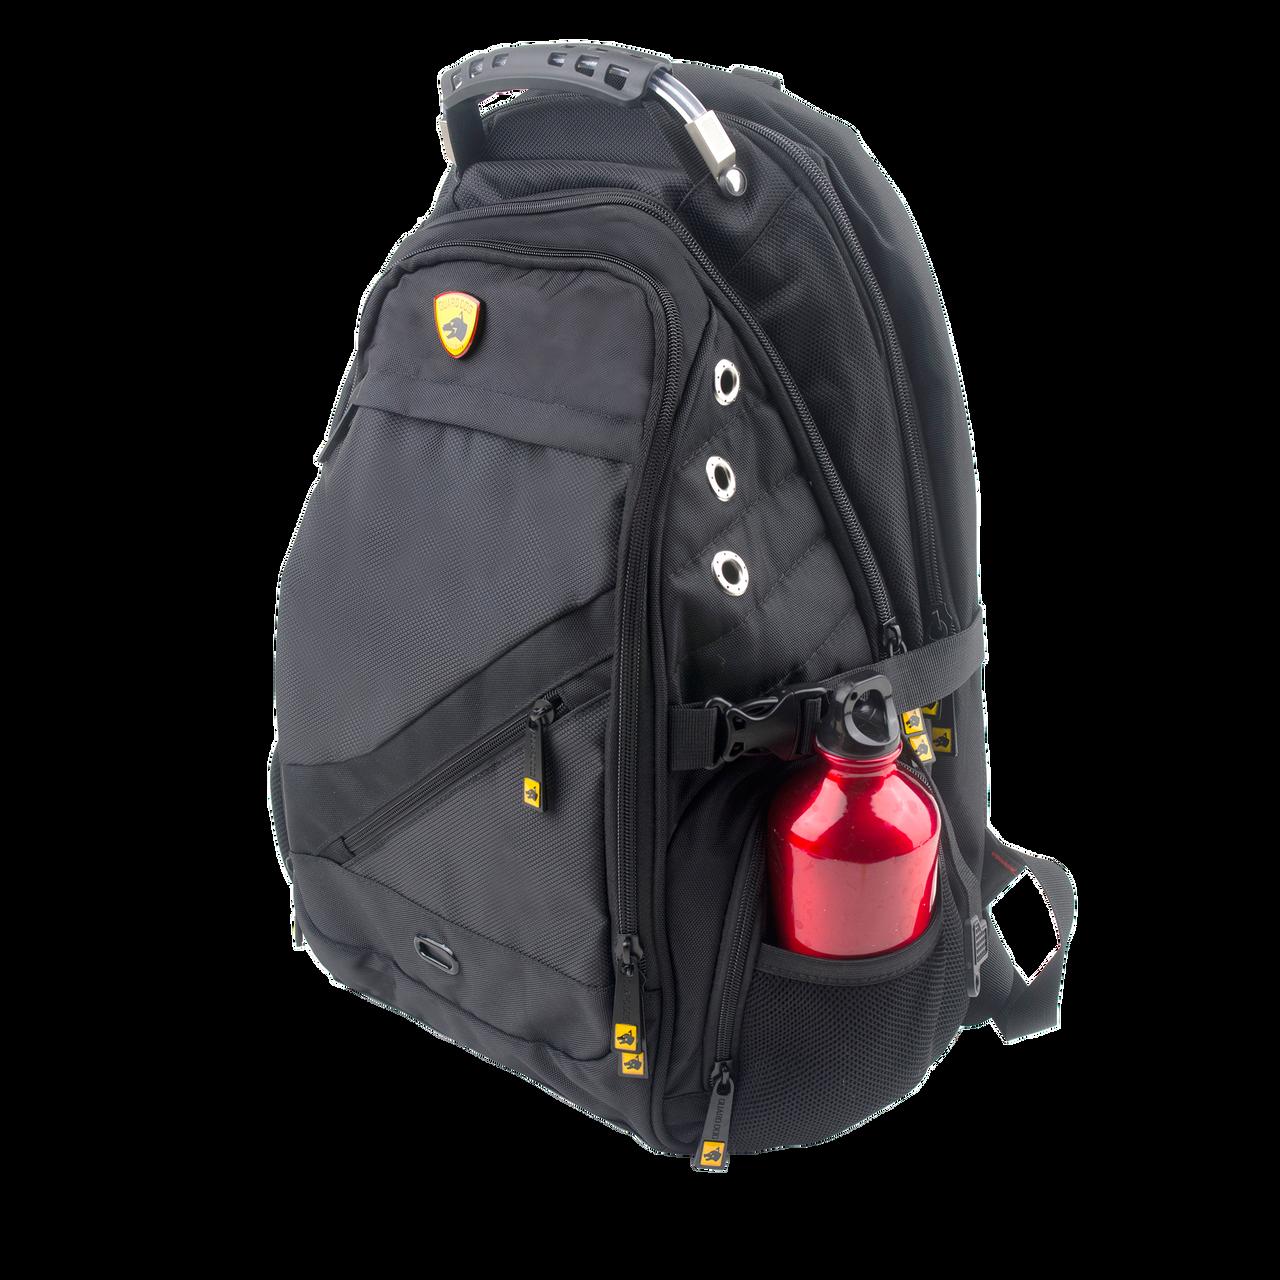 Guard Dog Proshield Ii, Gdog Bpgdpbp2000 Proshield 2 Backpack Blk